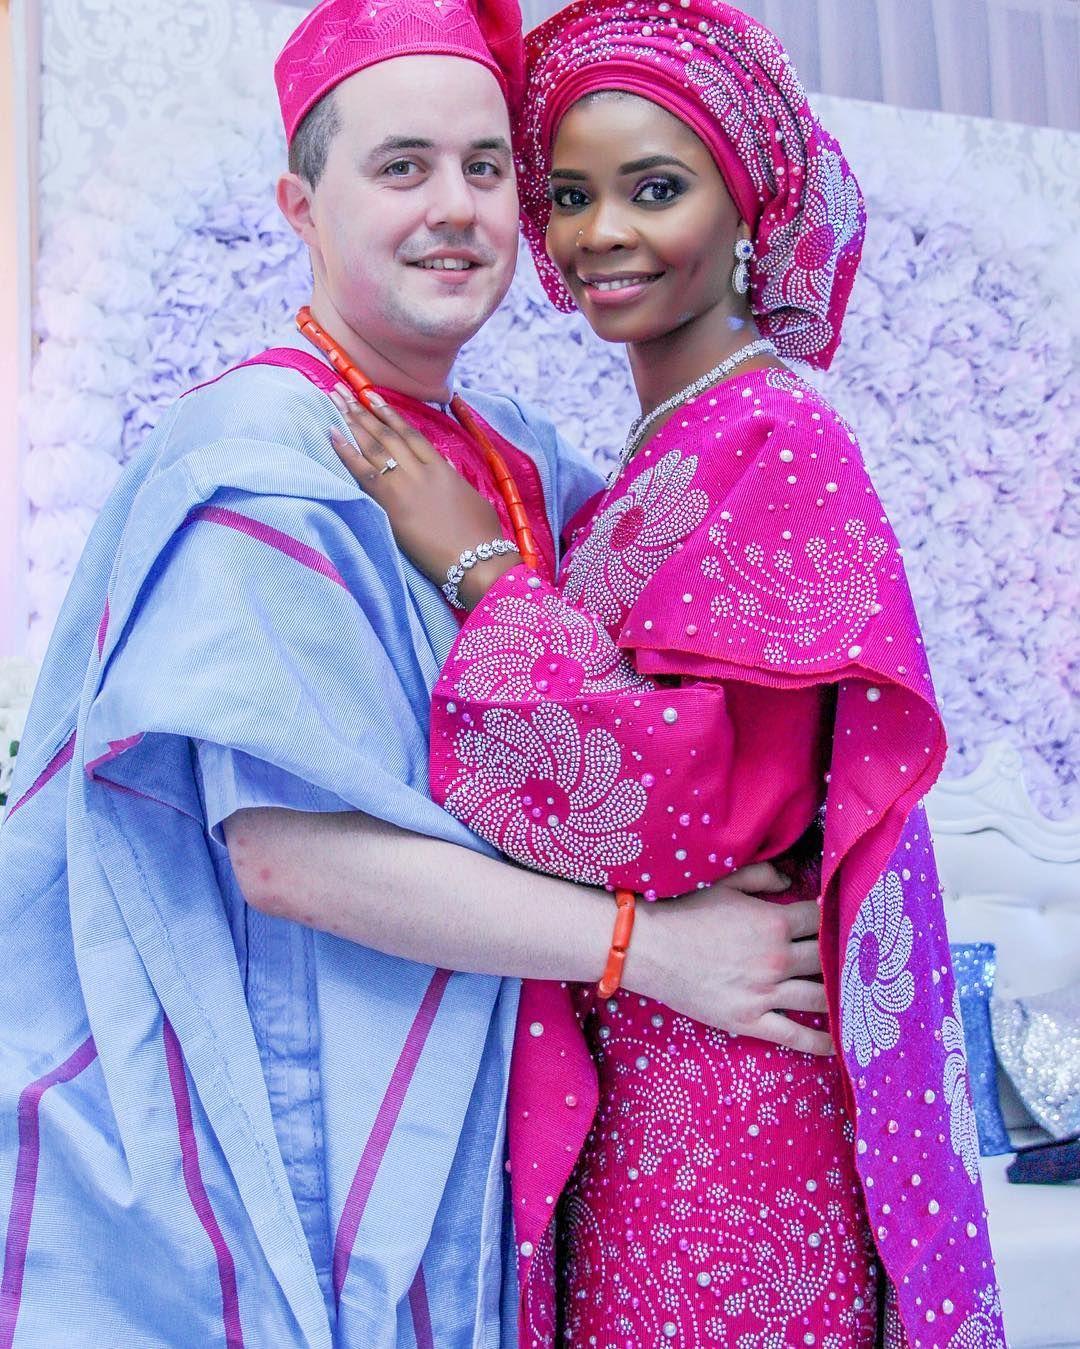 Pin de Emi02 Mela en Nigerian Traditonal Wedding lookbook | Pinterest